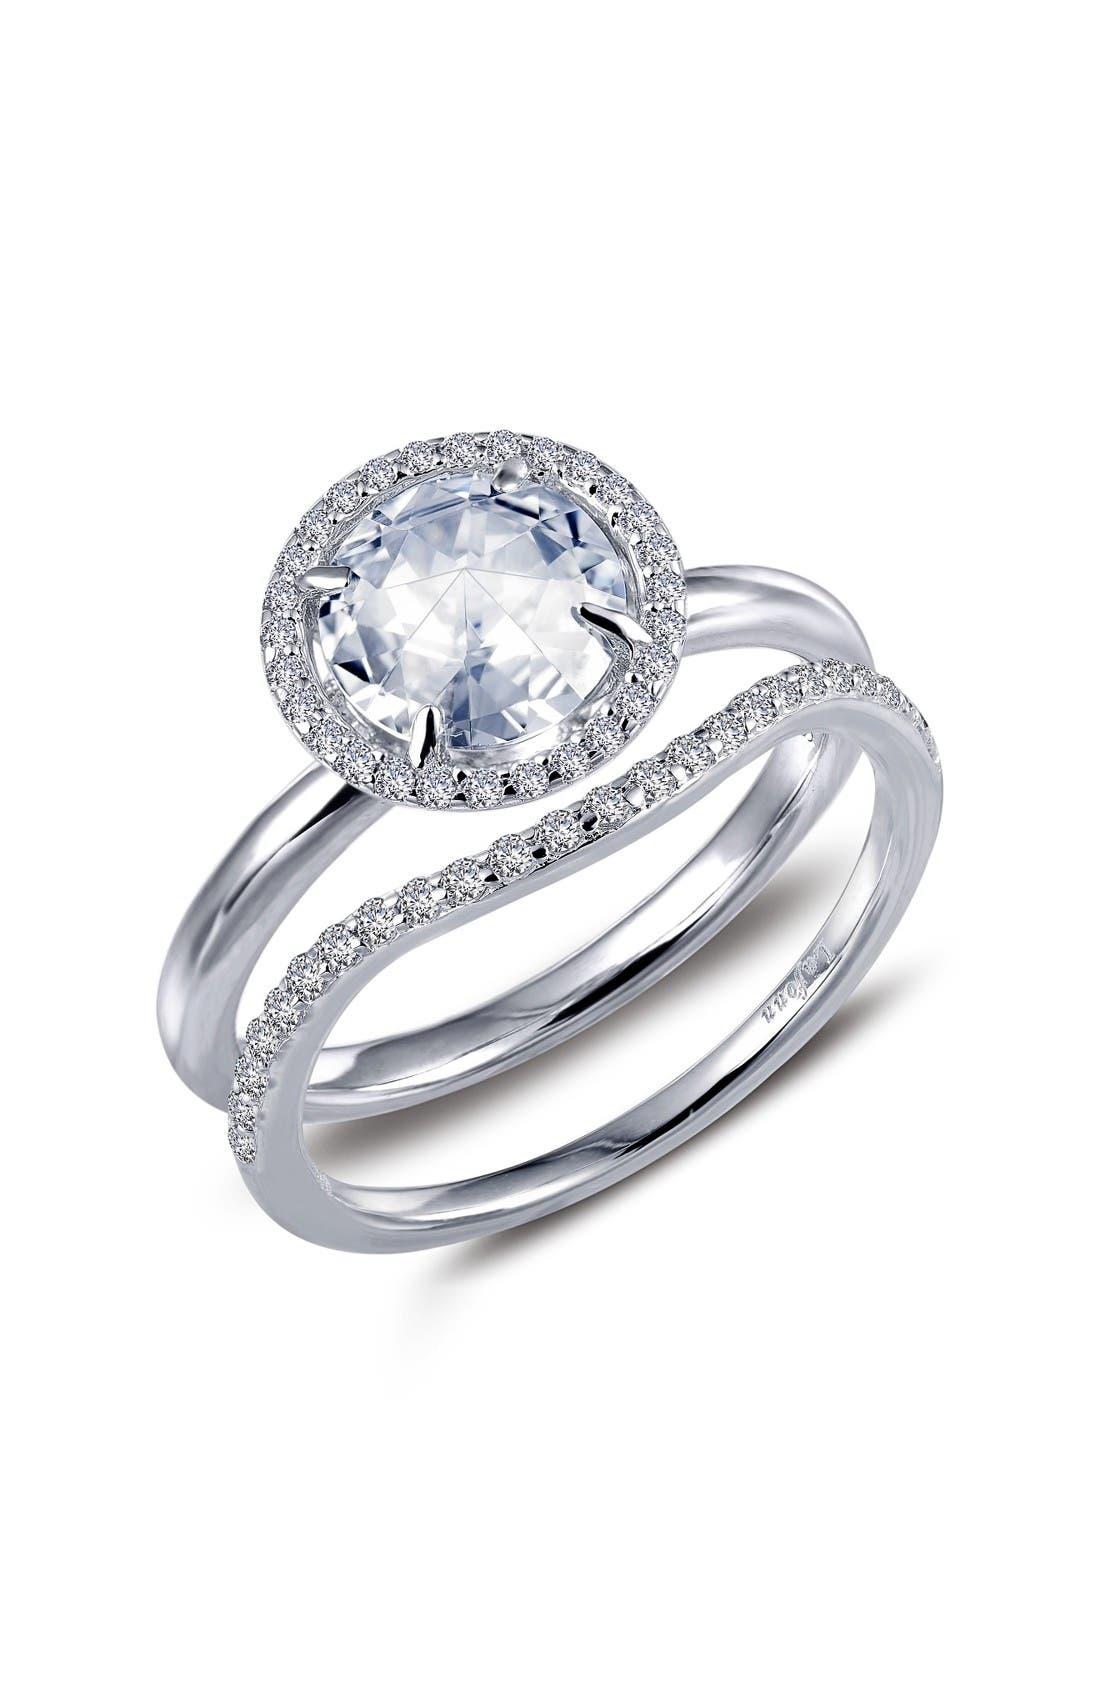 Main Image - Lafonn Rose Cut Simulated Diamond Ring & Band